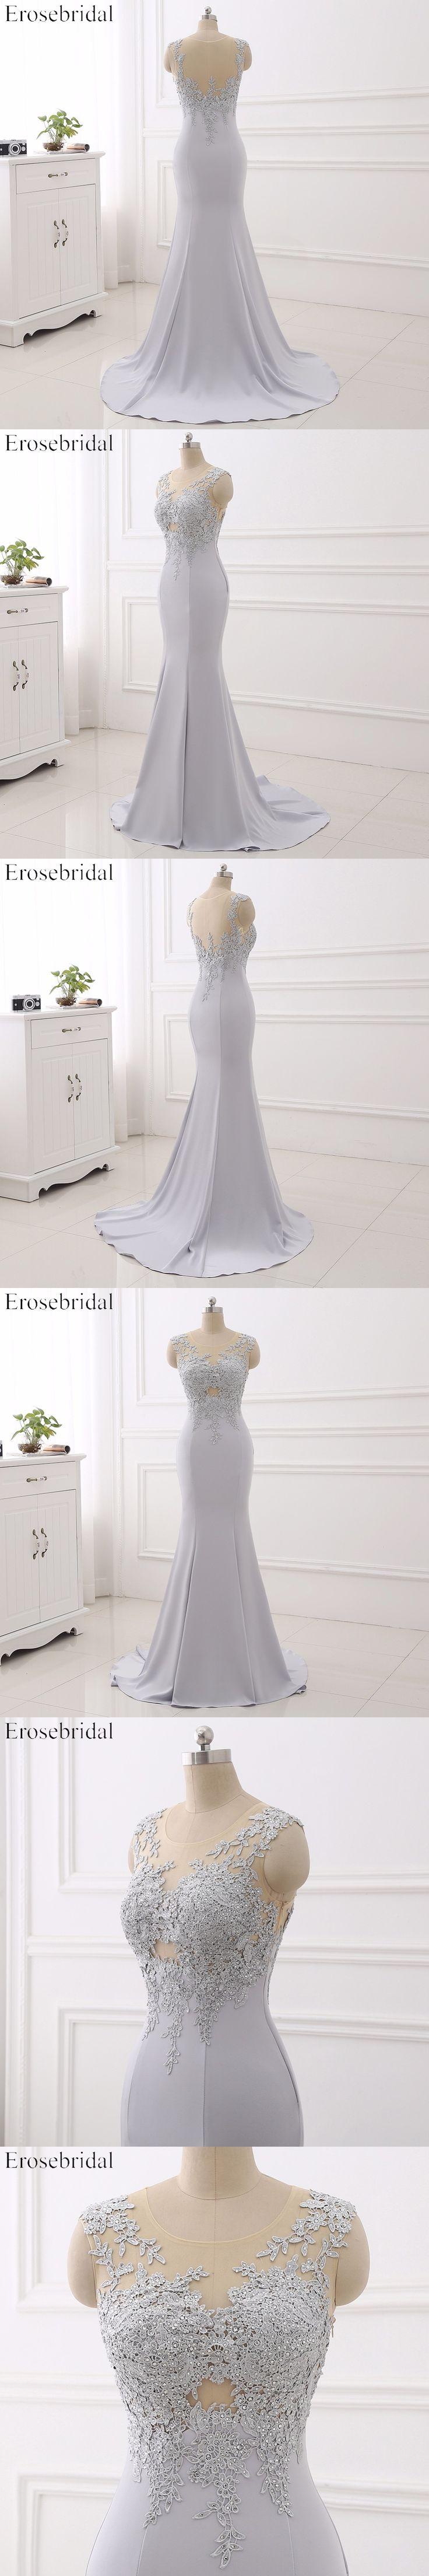 2017 Illusion Prom Dresses Erosebridal Mermaid Evening Dress Sheer Neck Formal Women Wear Appliques Vestido De Festa